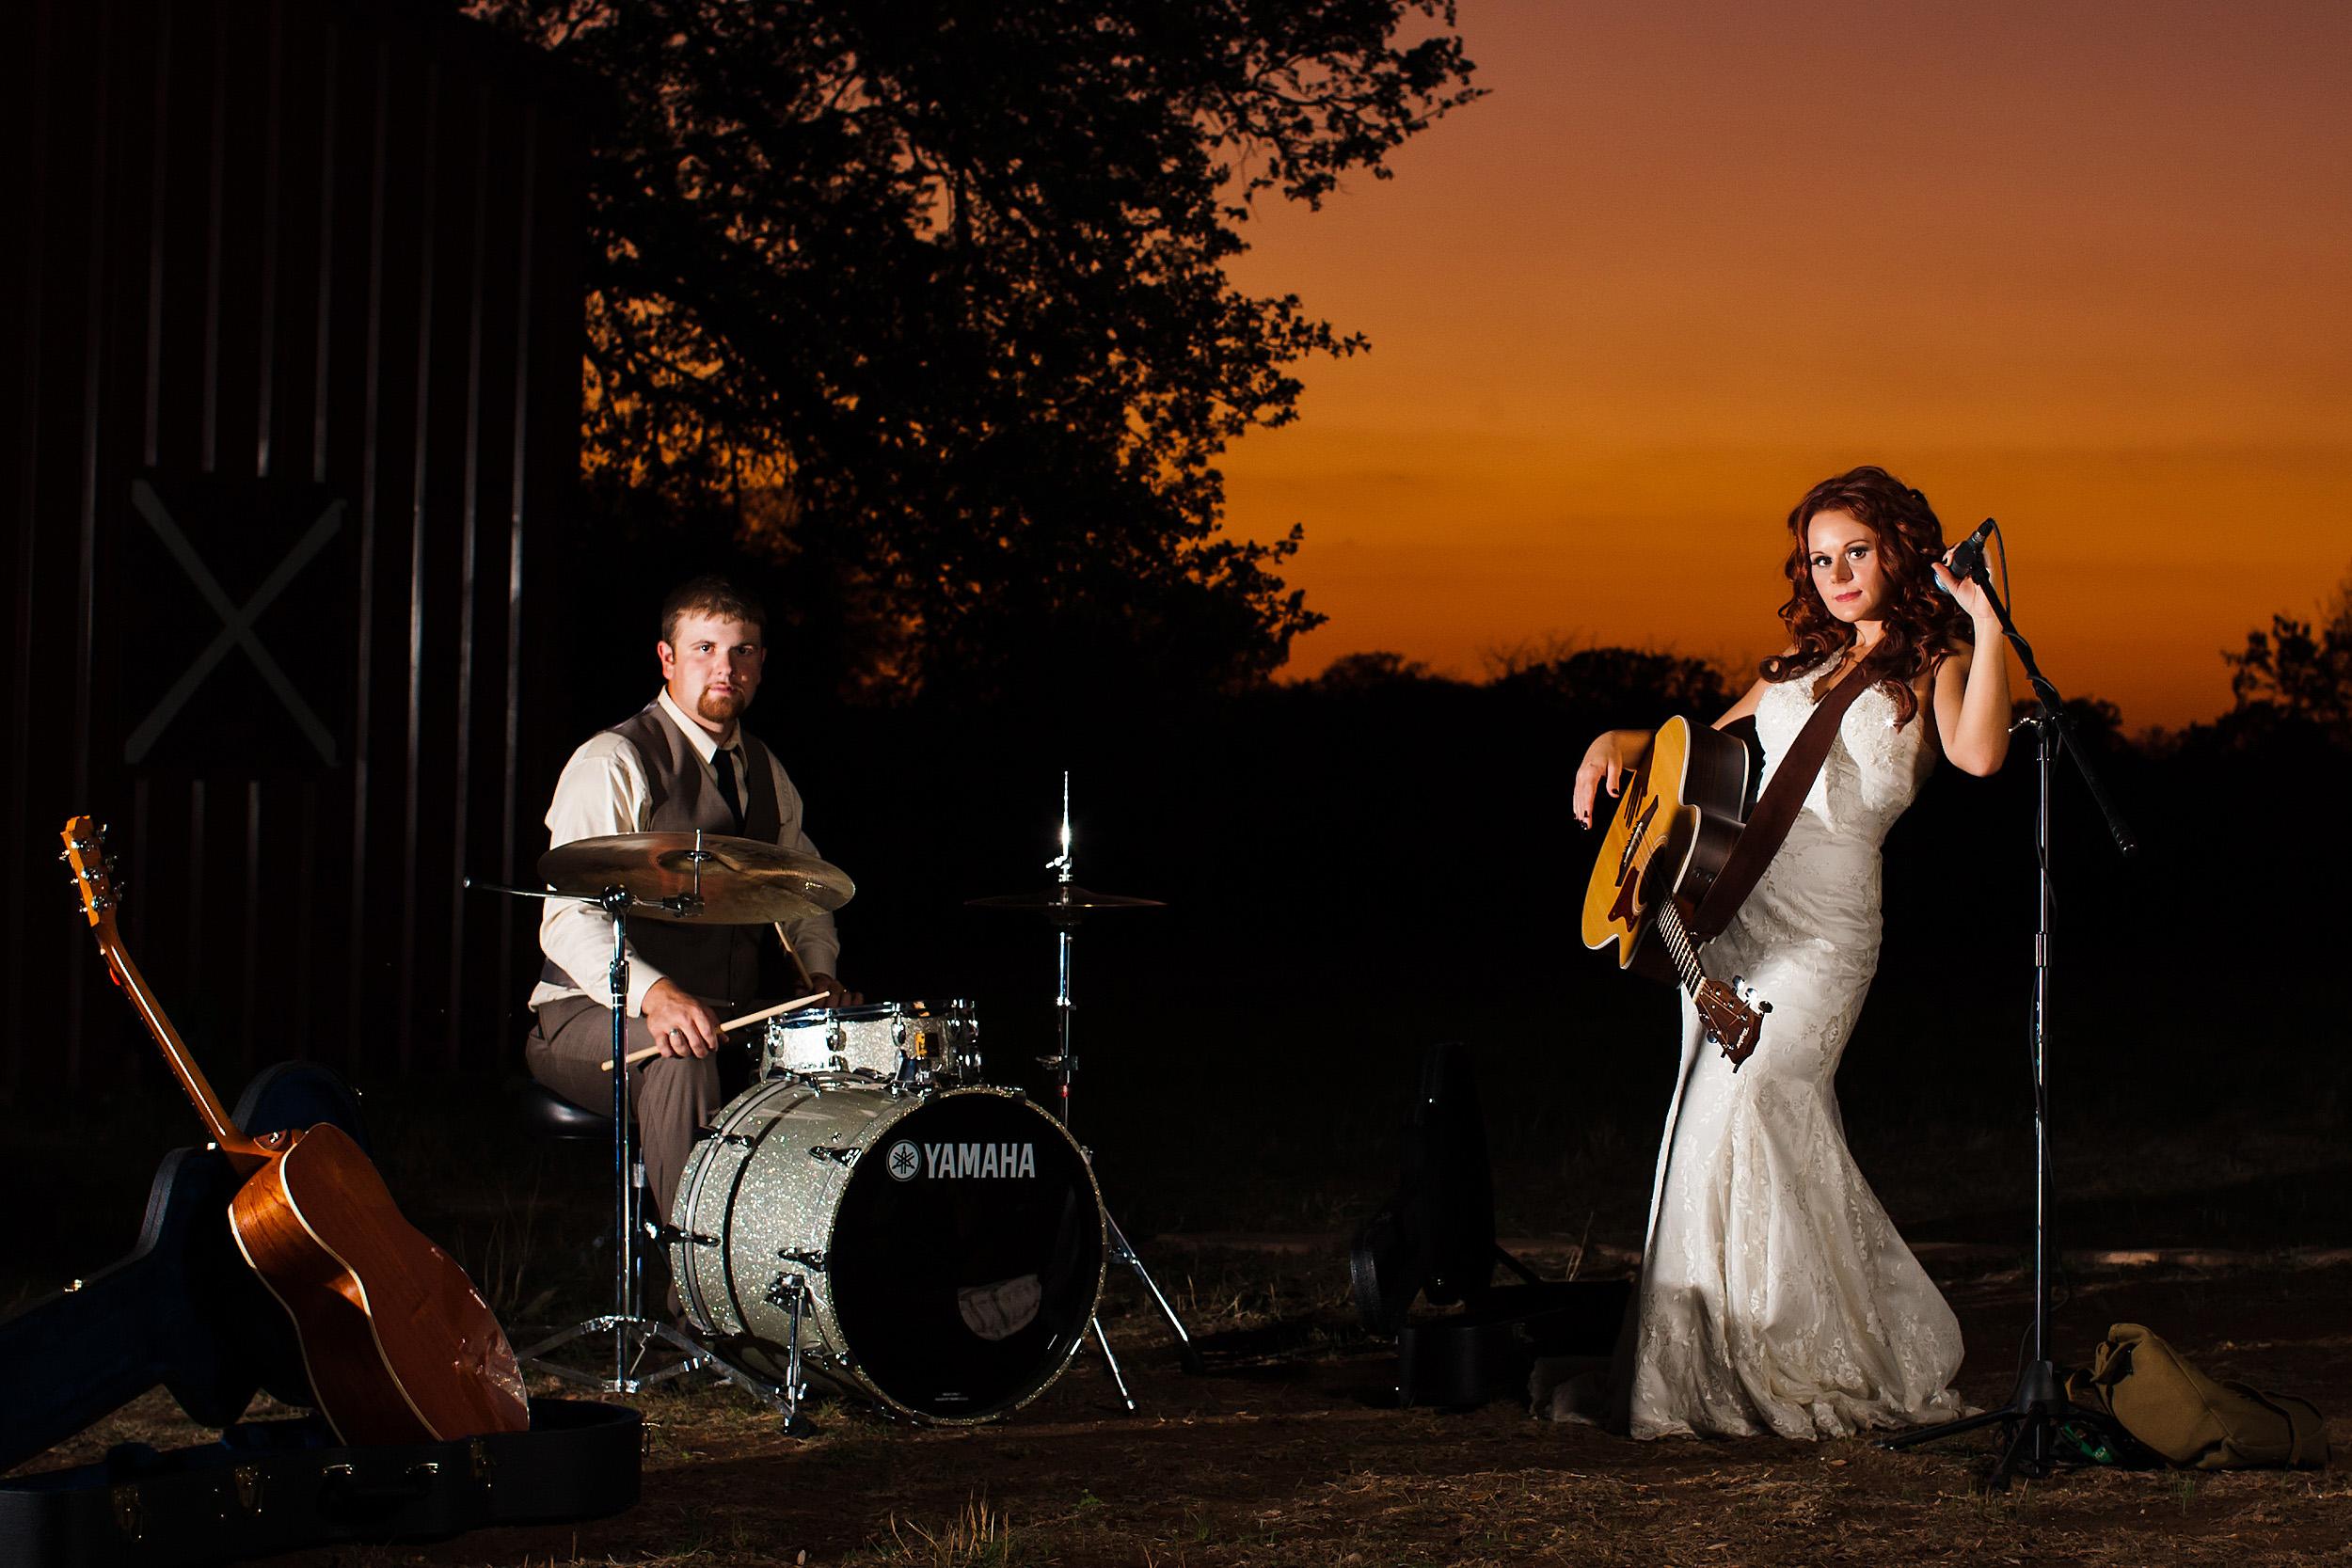 austin-wedding-mike-reed-16.jpg